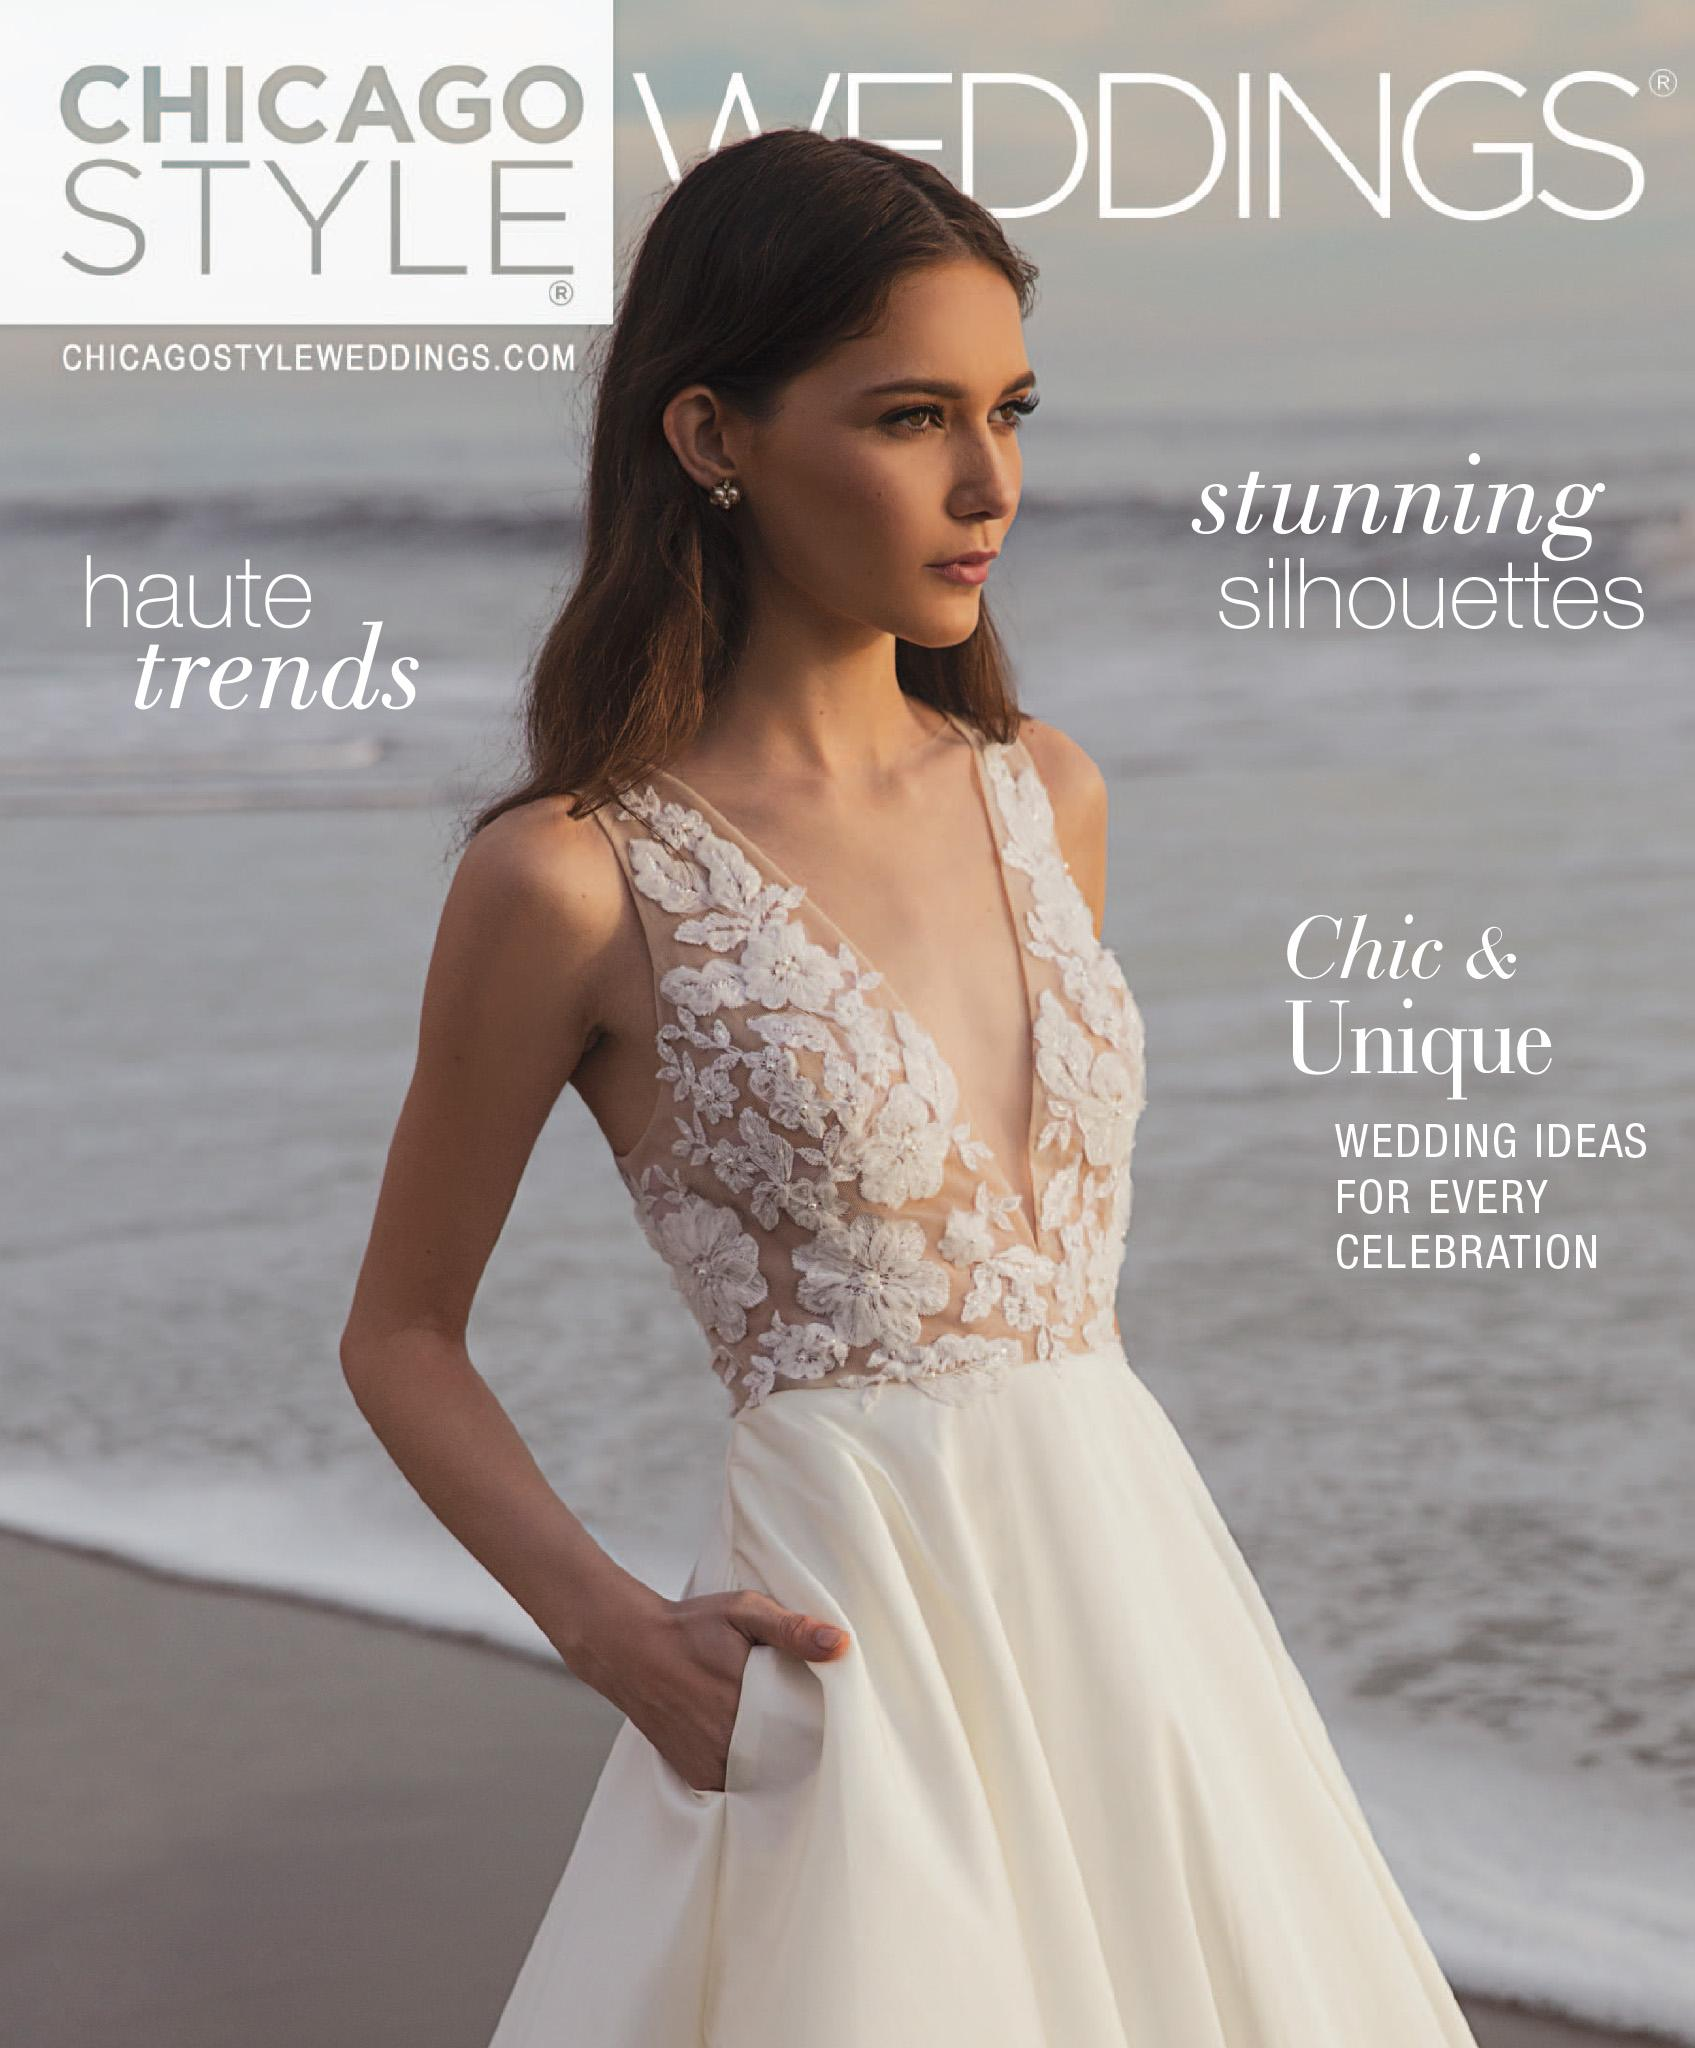 ChicagoStyle Weddings - November / December 2019 Issue | Wedding Magazine | Chicago Magazine | Bridal Magazine